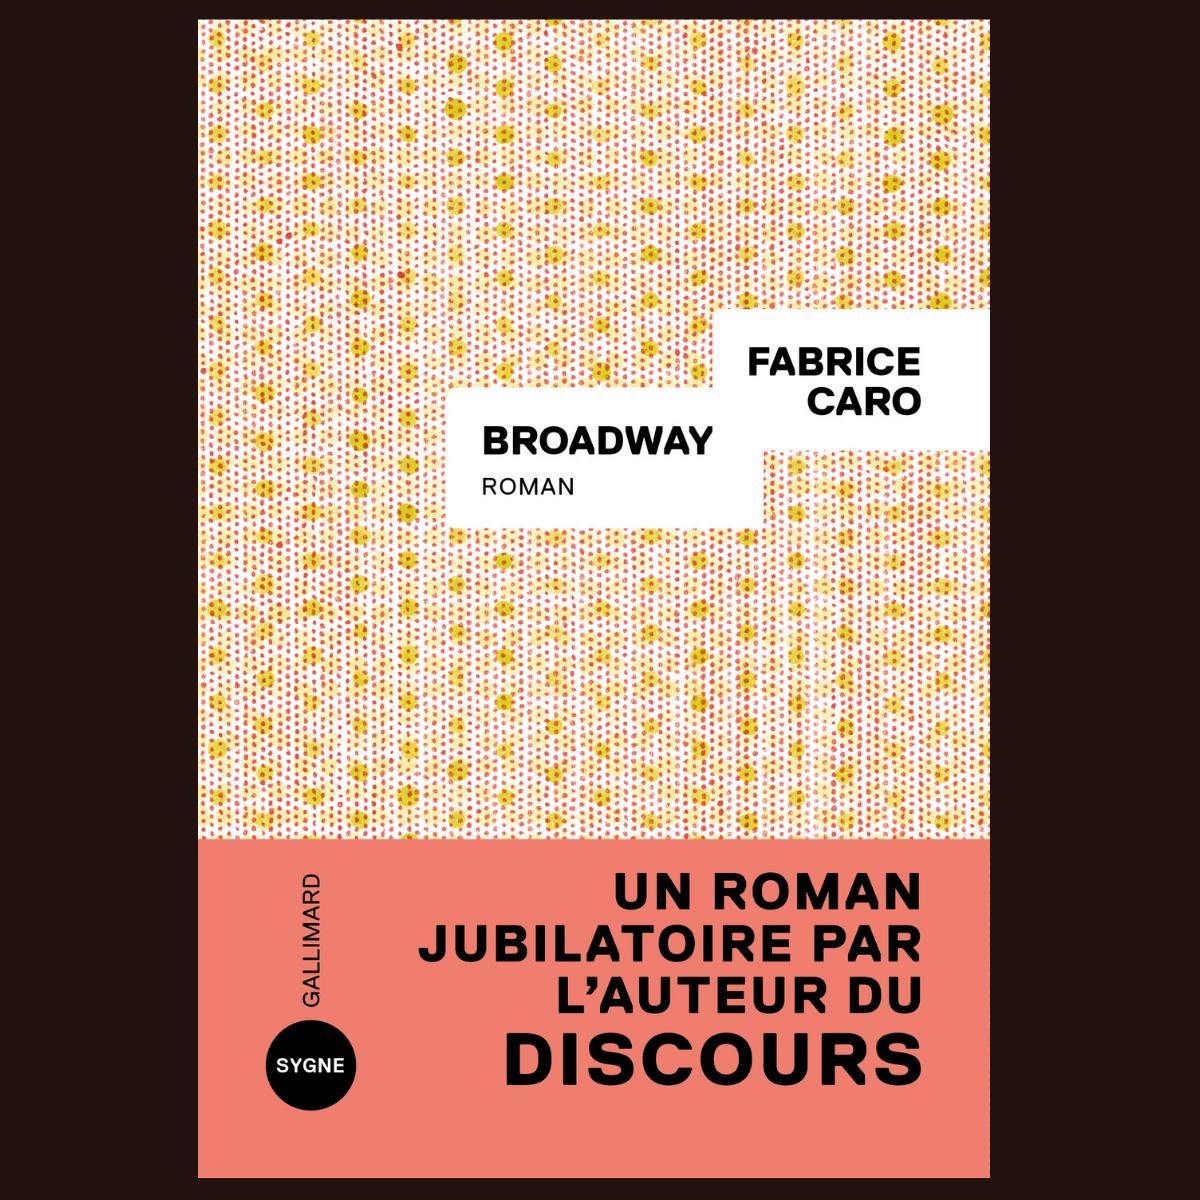 Broadway - Fabrice Caro (Gallimard Sygne)